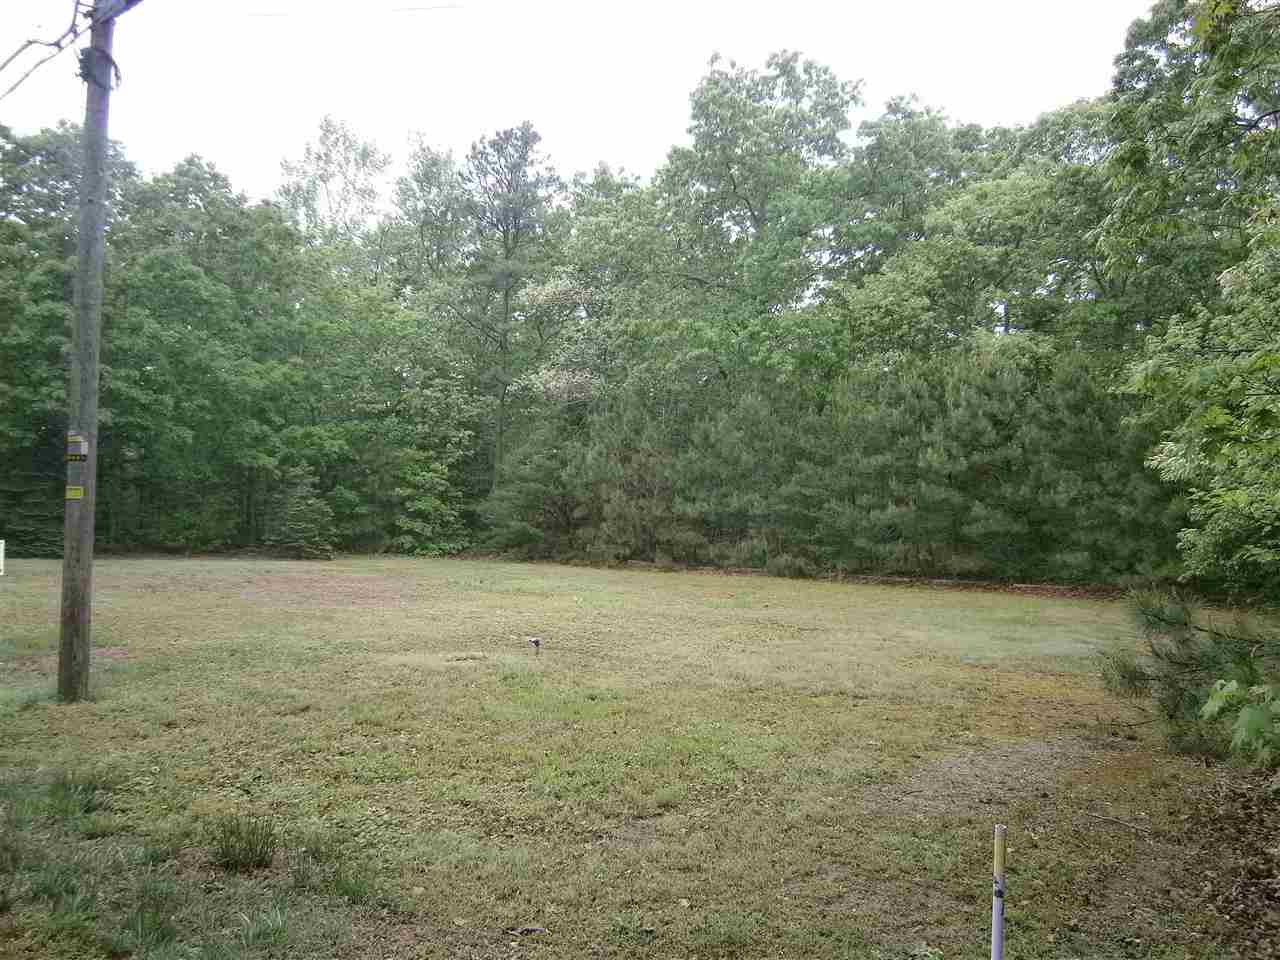 土地 / 的地塊 为 销售 在 14 Whiting Lane 14 Whiting Lane Swainton, 新泽西州 08210 美国